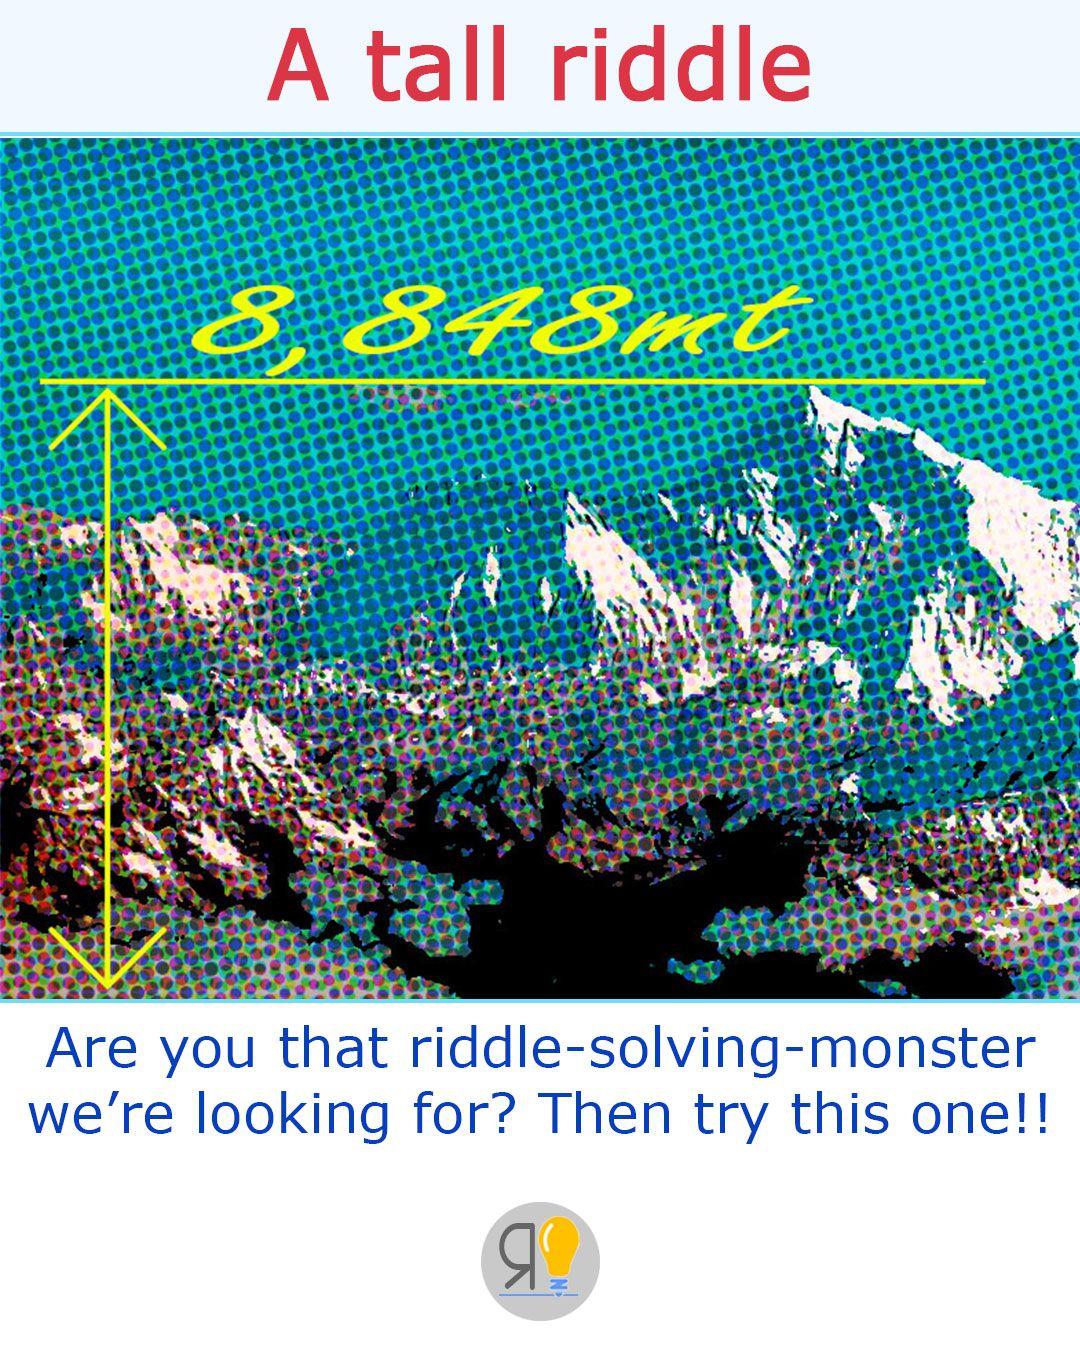 Pin van Riddles and Brain teasers op जवाब के साथ पहेलियों